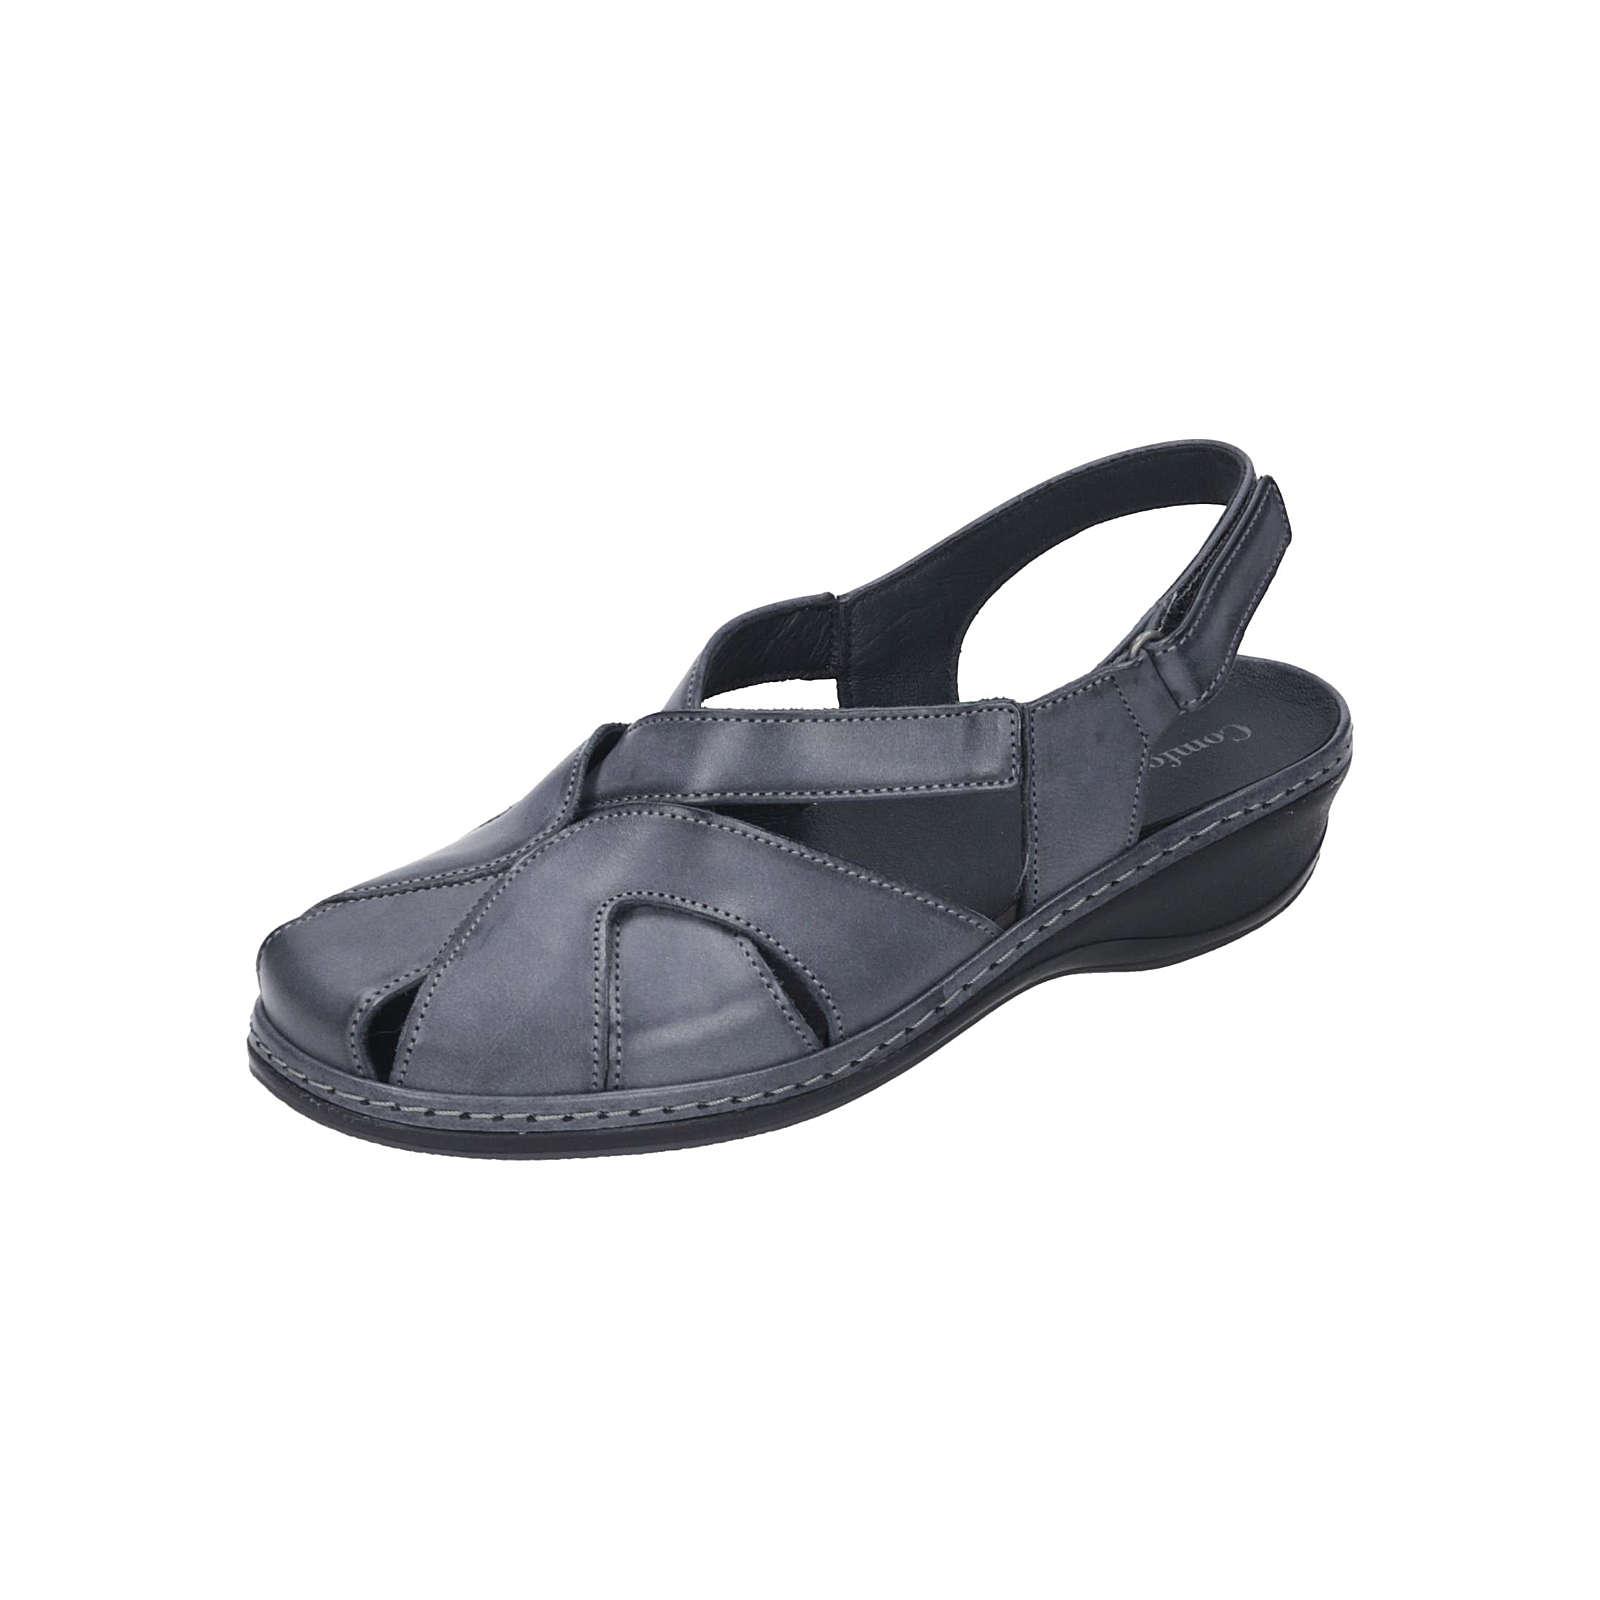 Comfortabel Damen Sling Komfort-Sandalen grau Damen Gr. 41